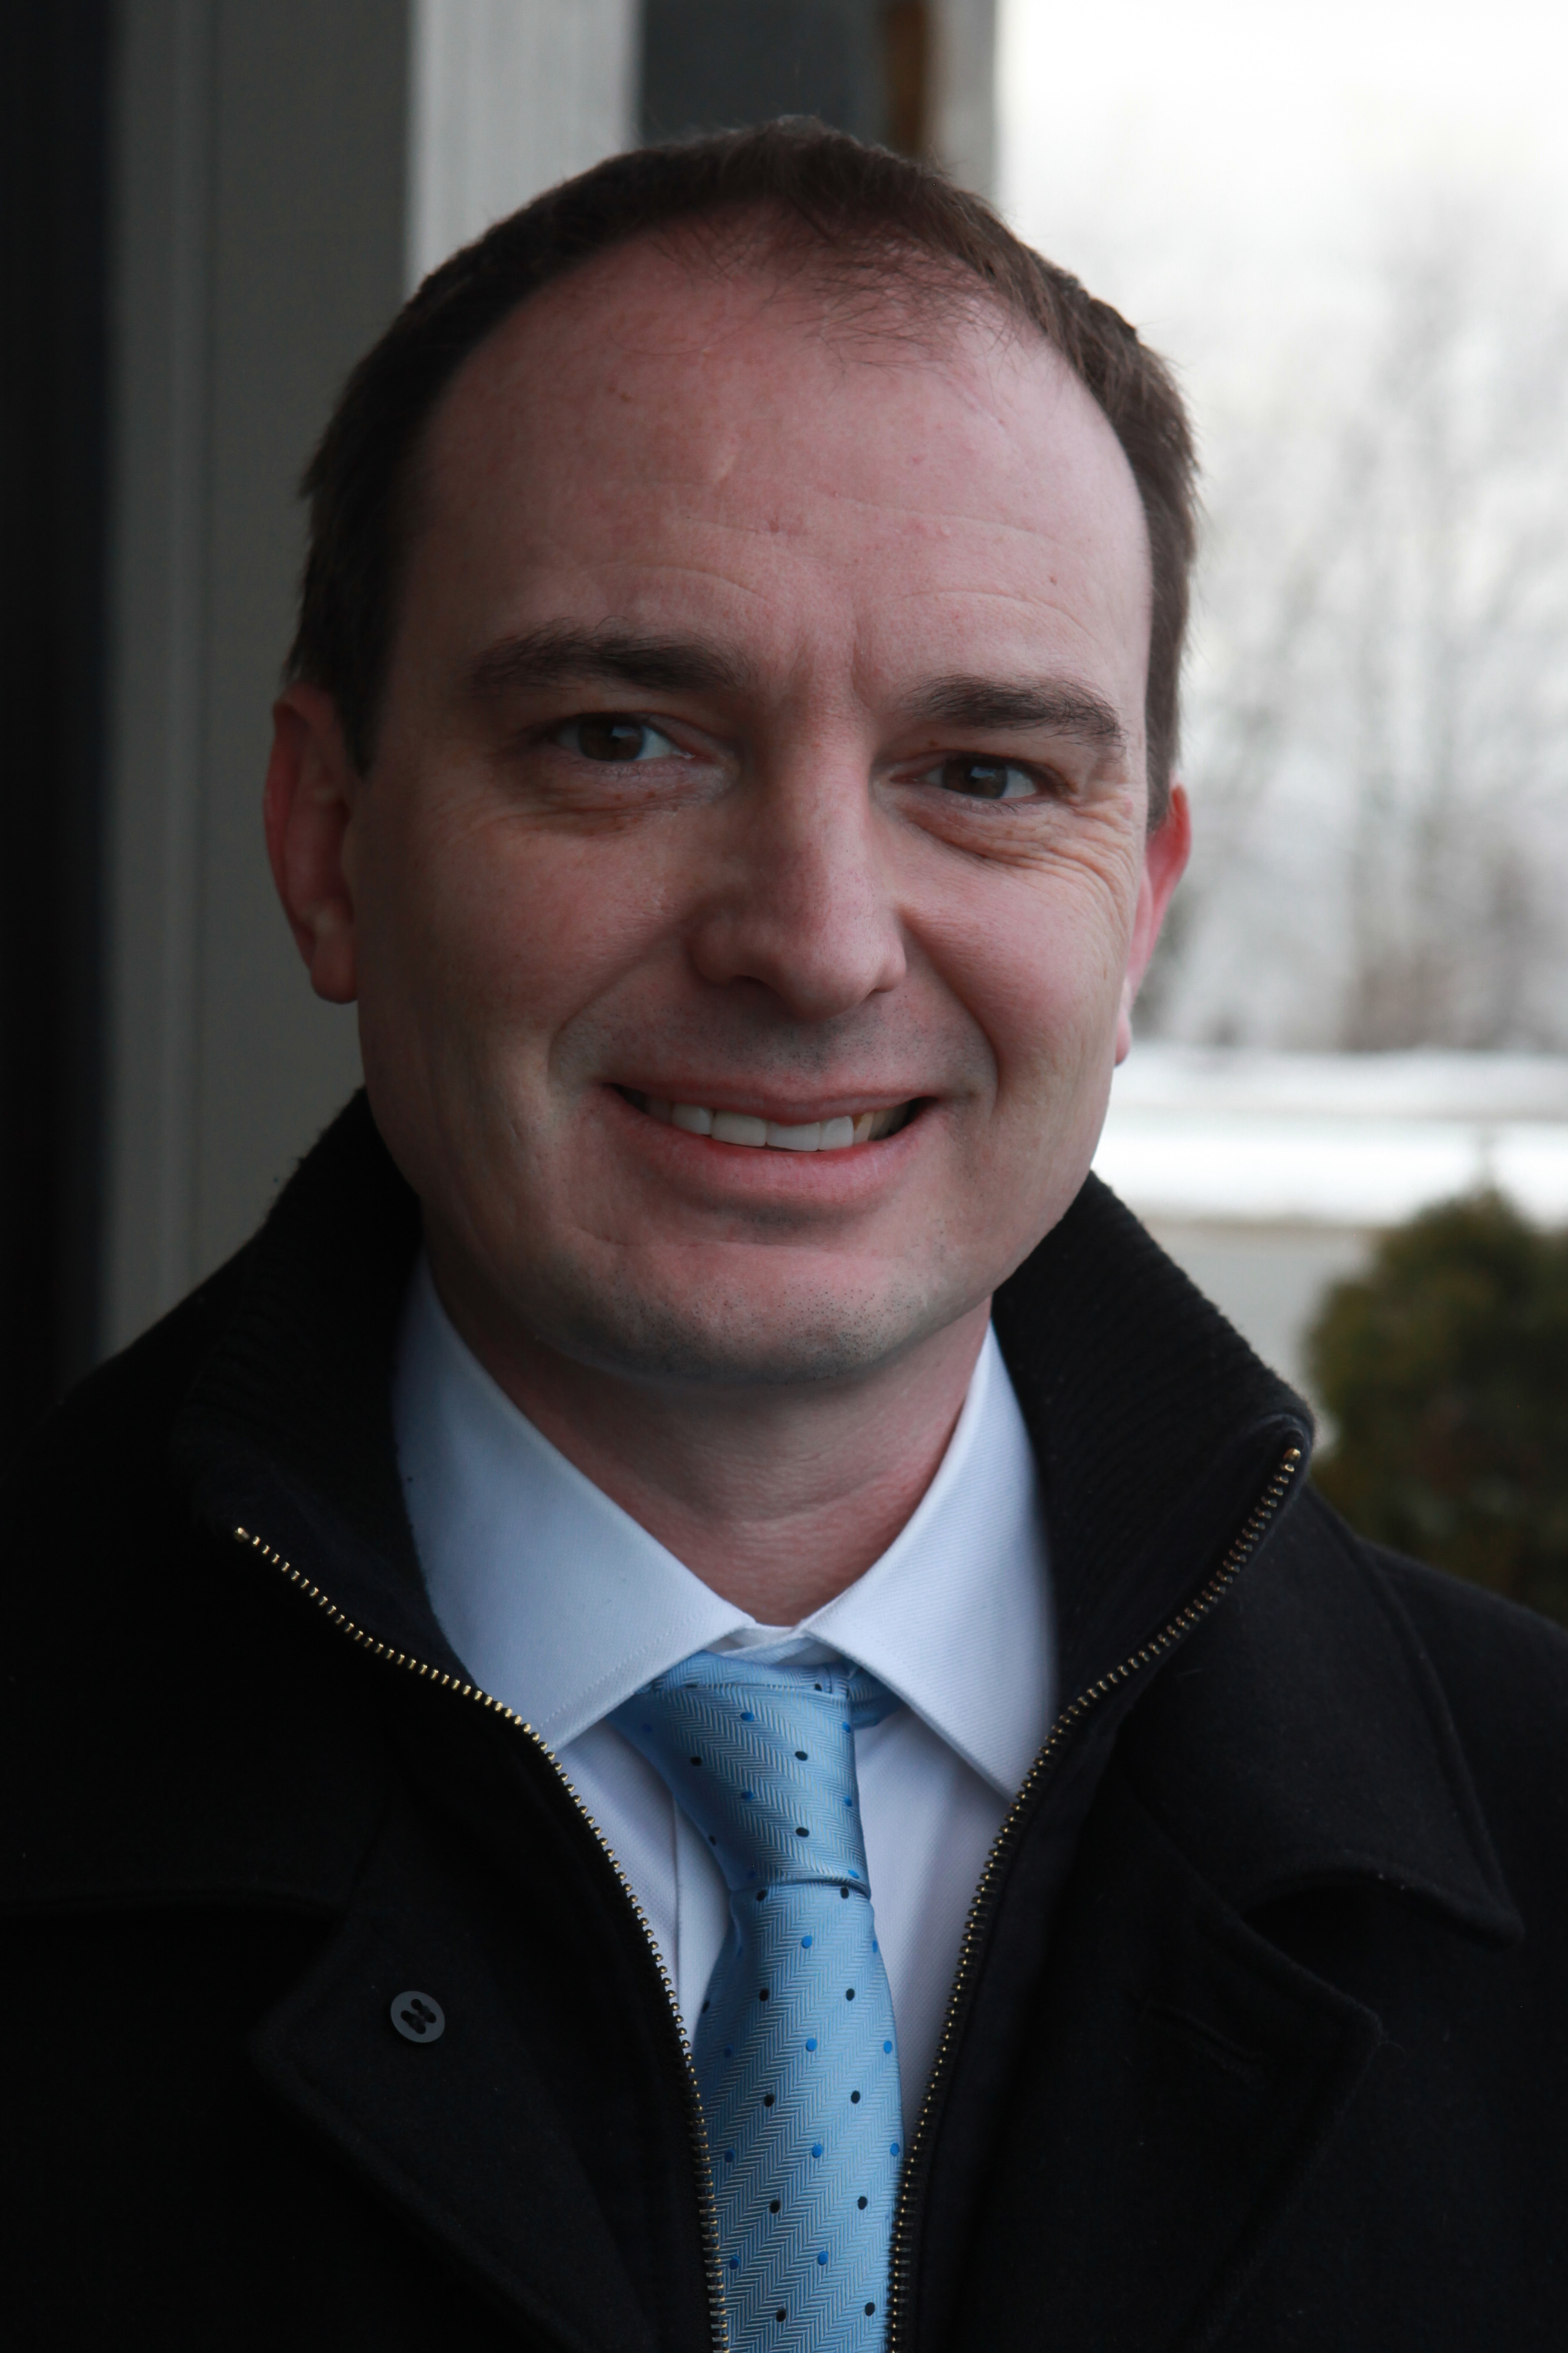 Micah Andras